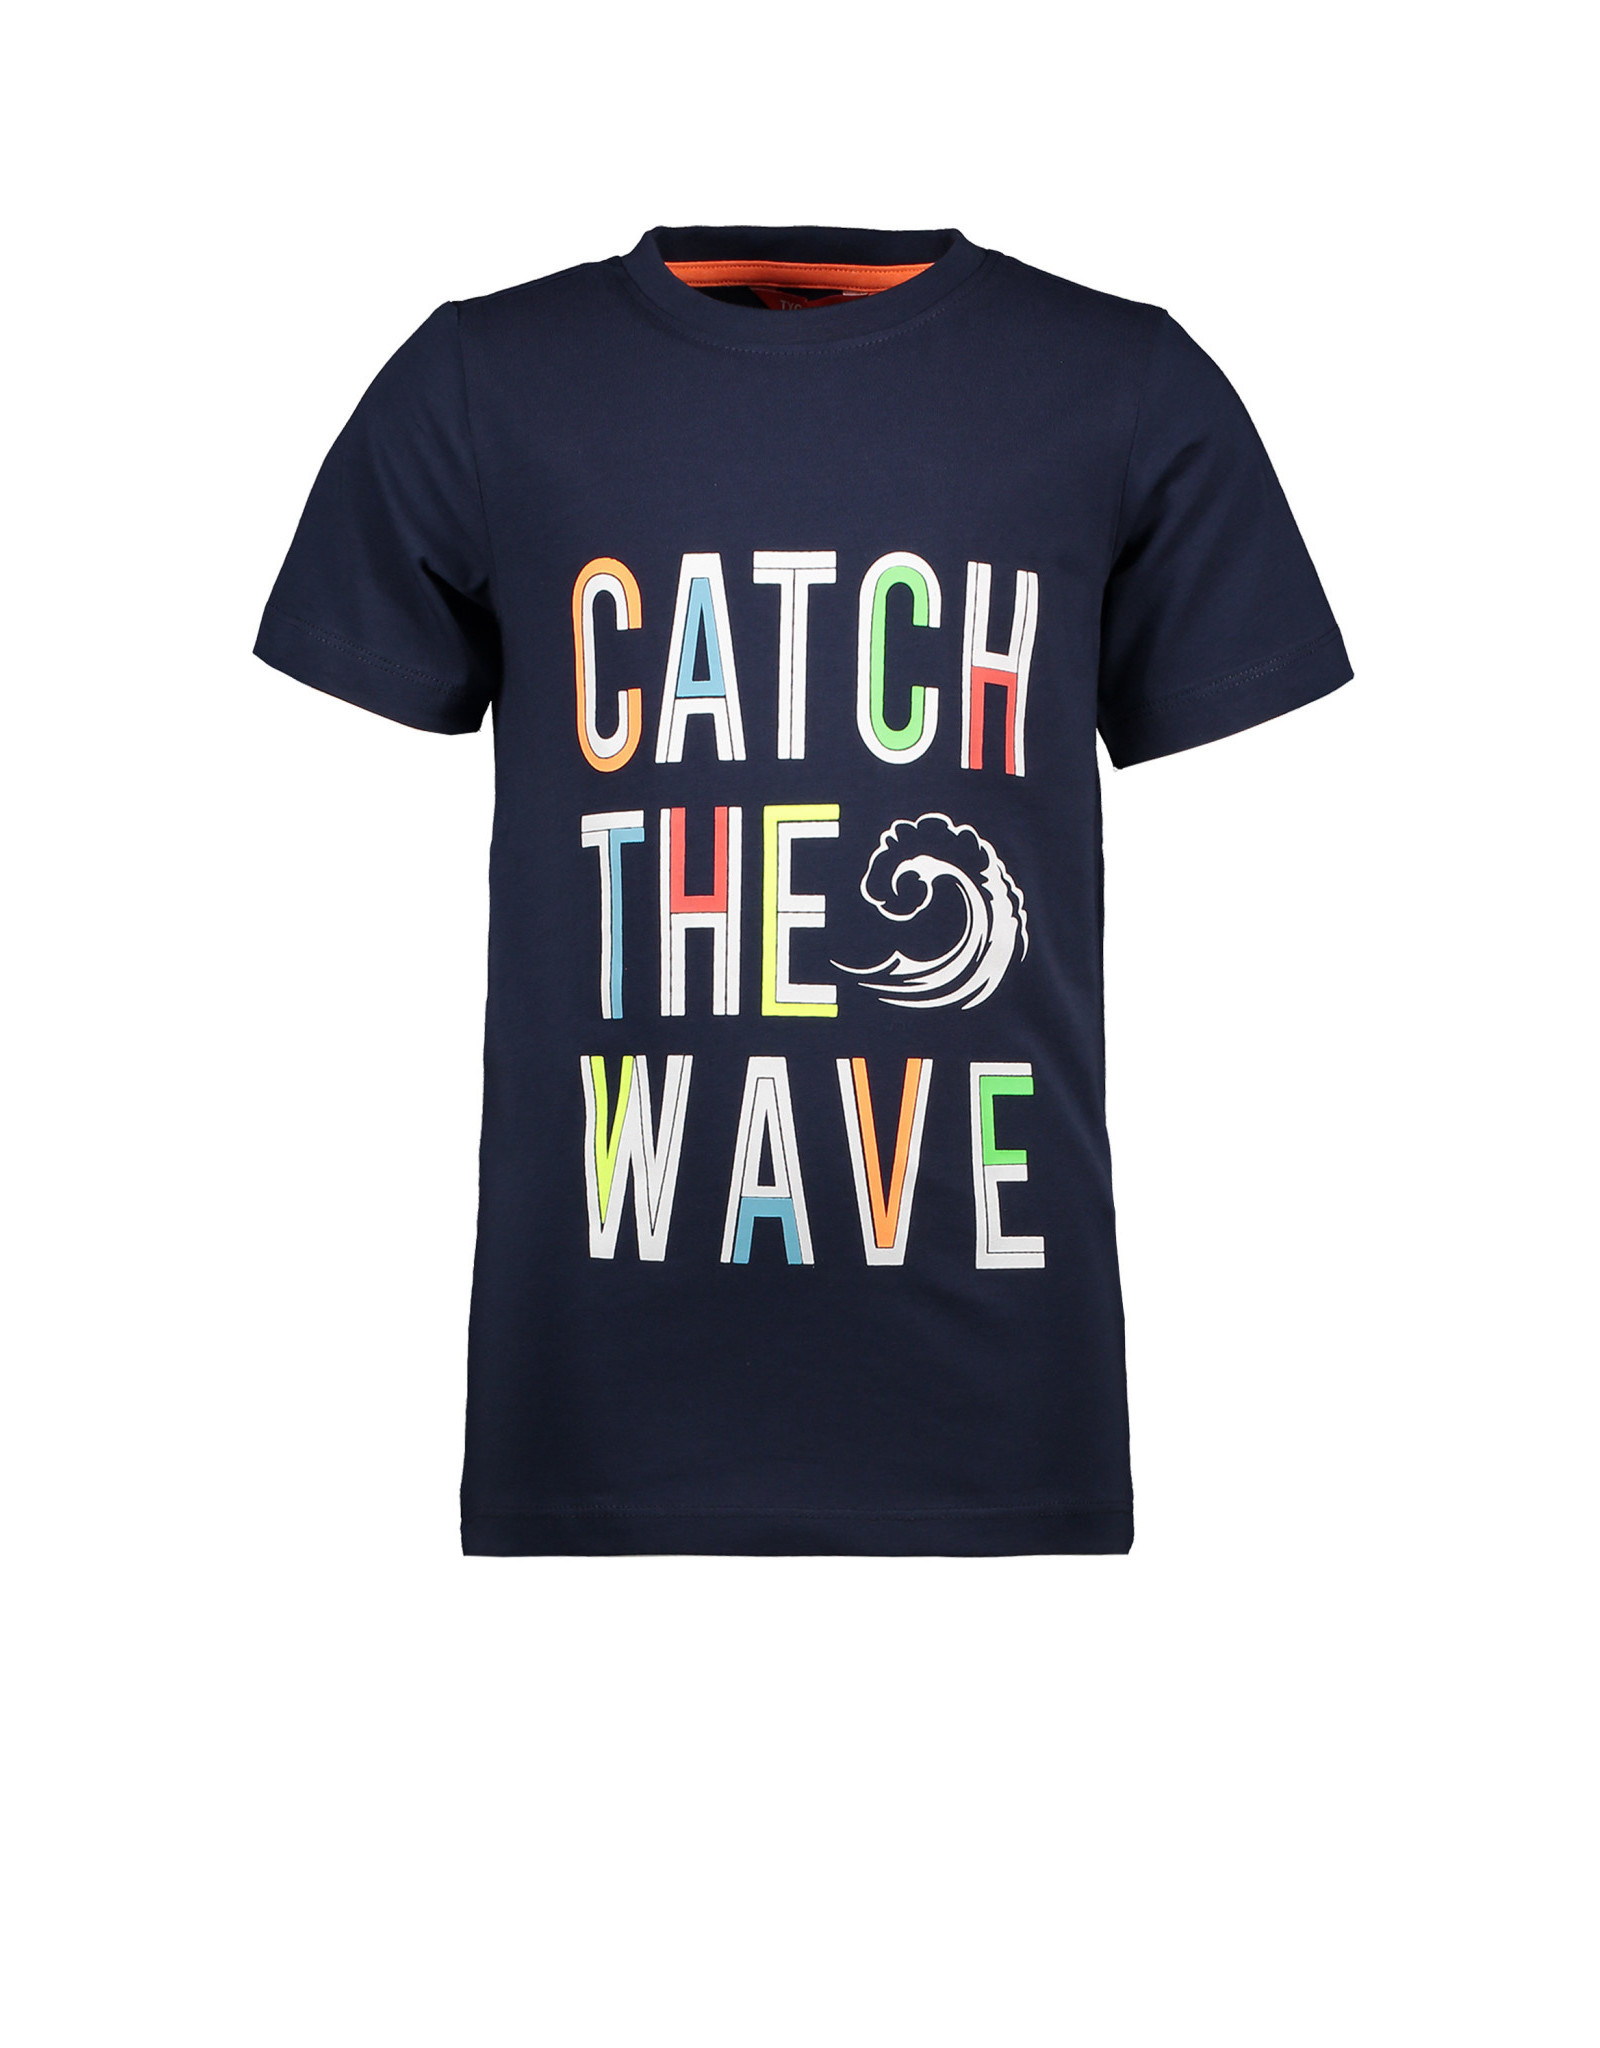 TYGO&vito t-shirt catch the wave